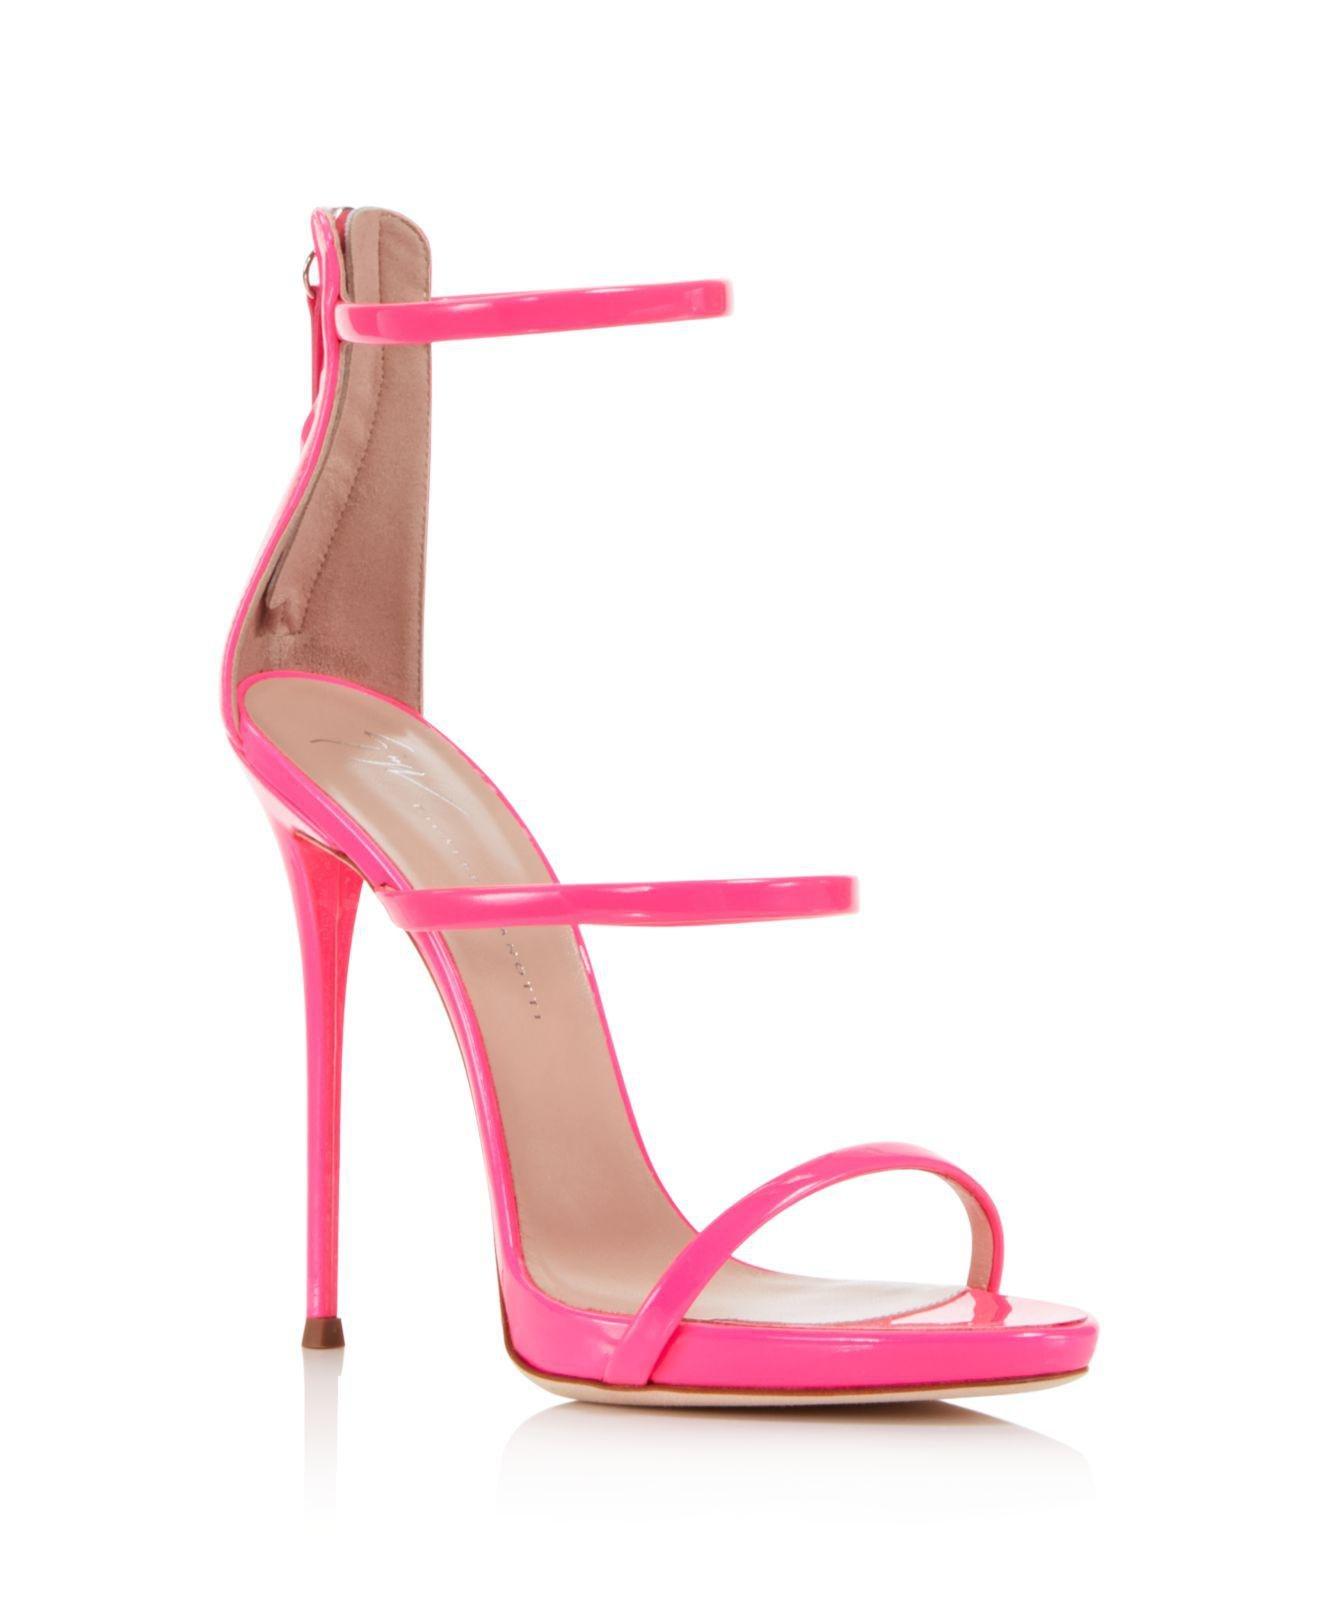 Giuseppe Zanotti Women's Vernice Patent Leather Ankle Strap High-Heel Sandals 5a1c3HfWZ3